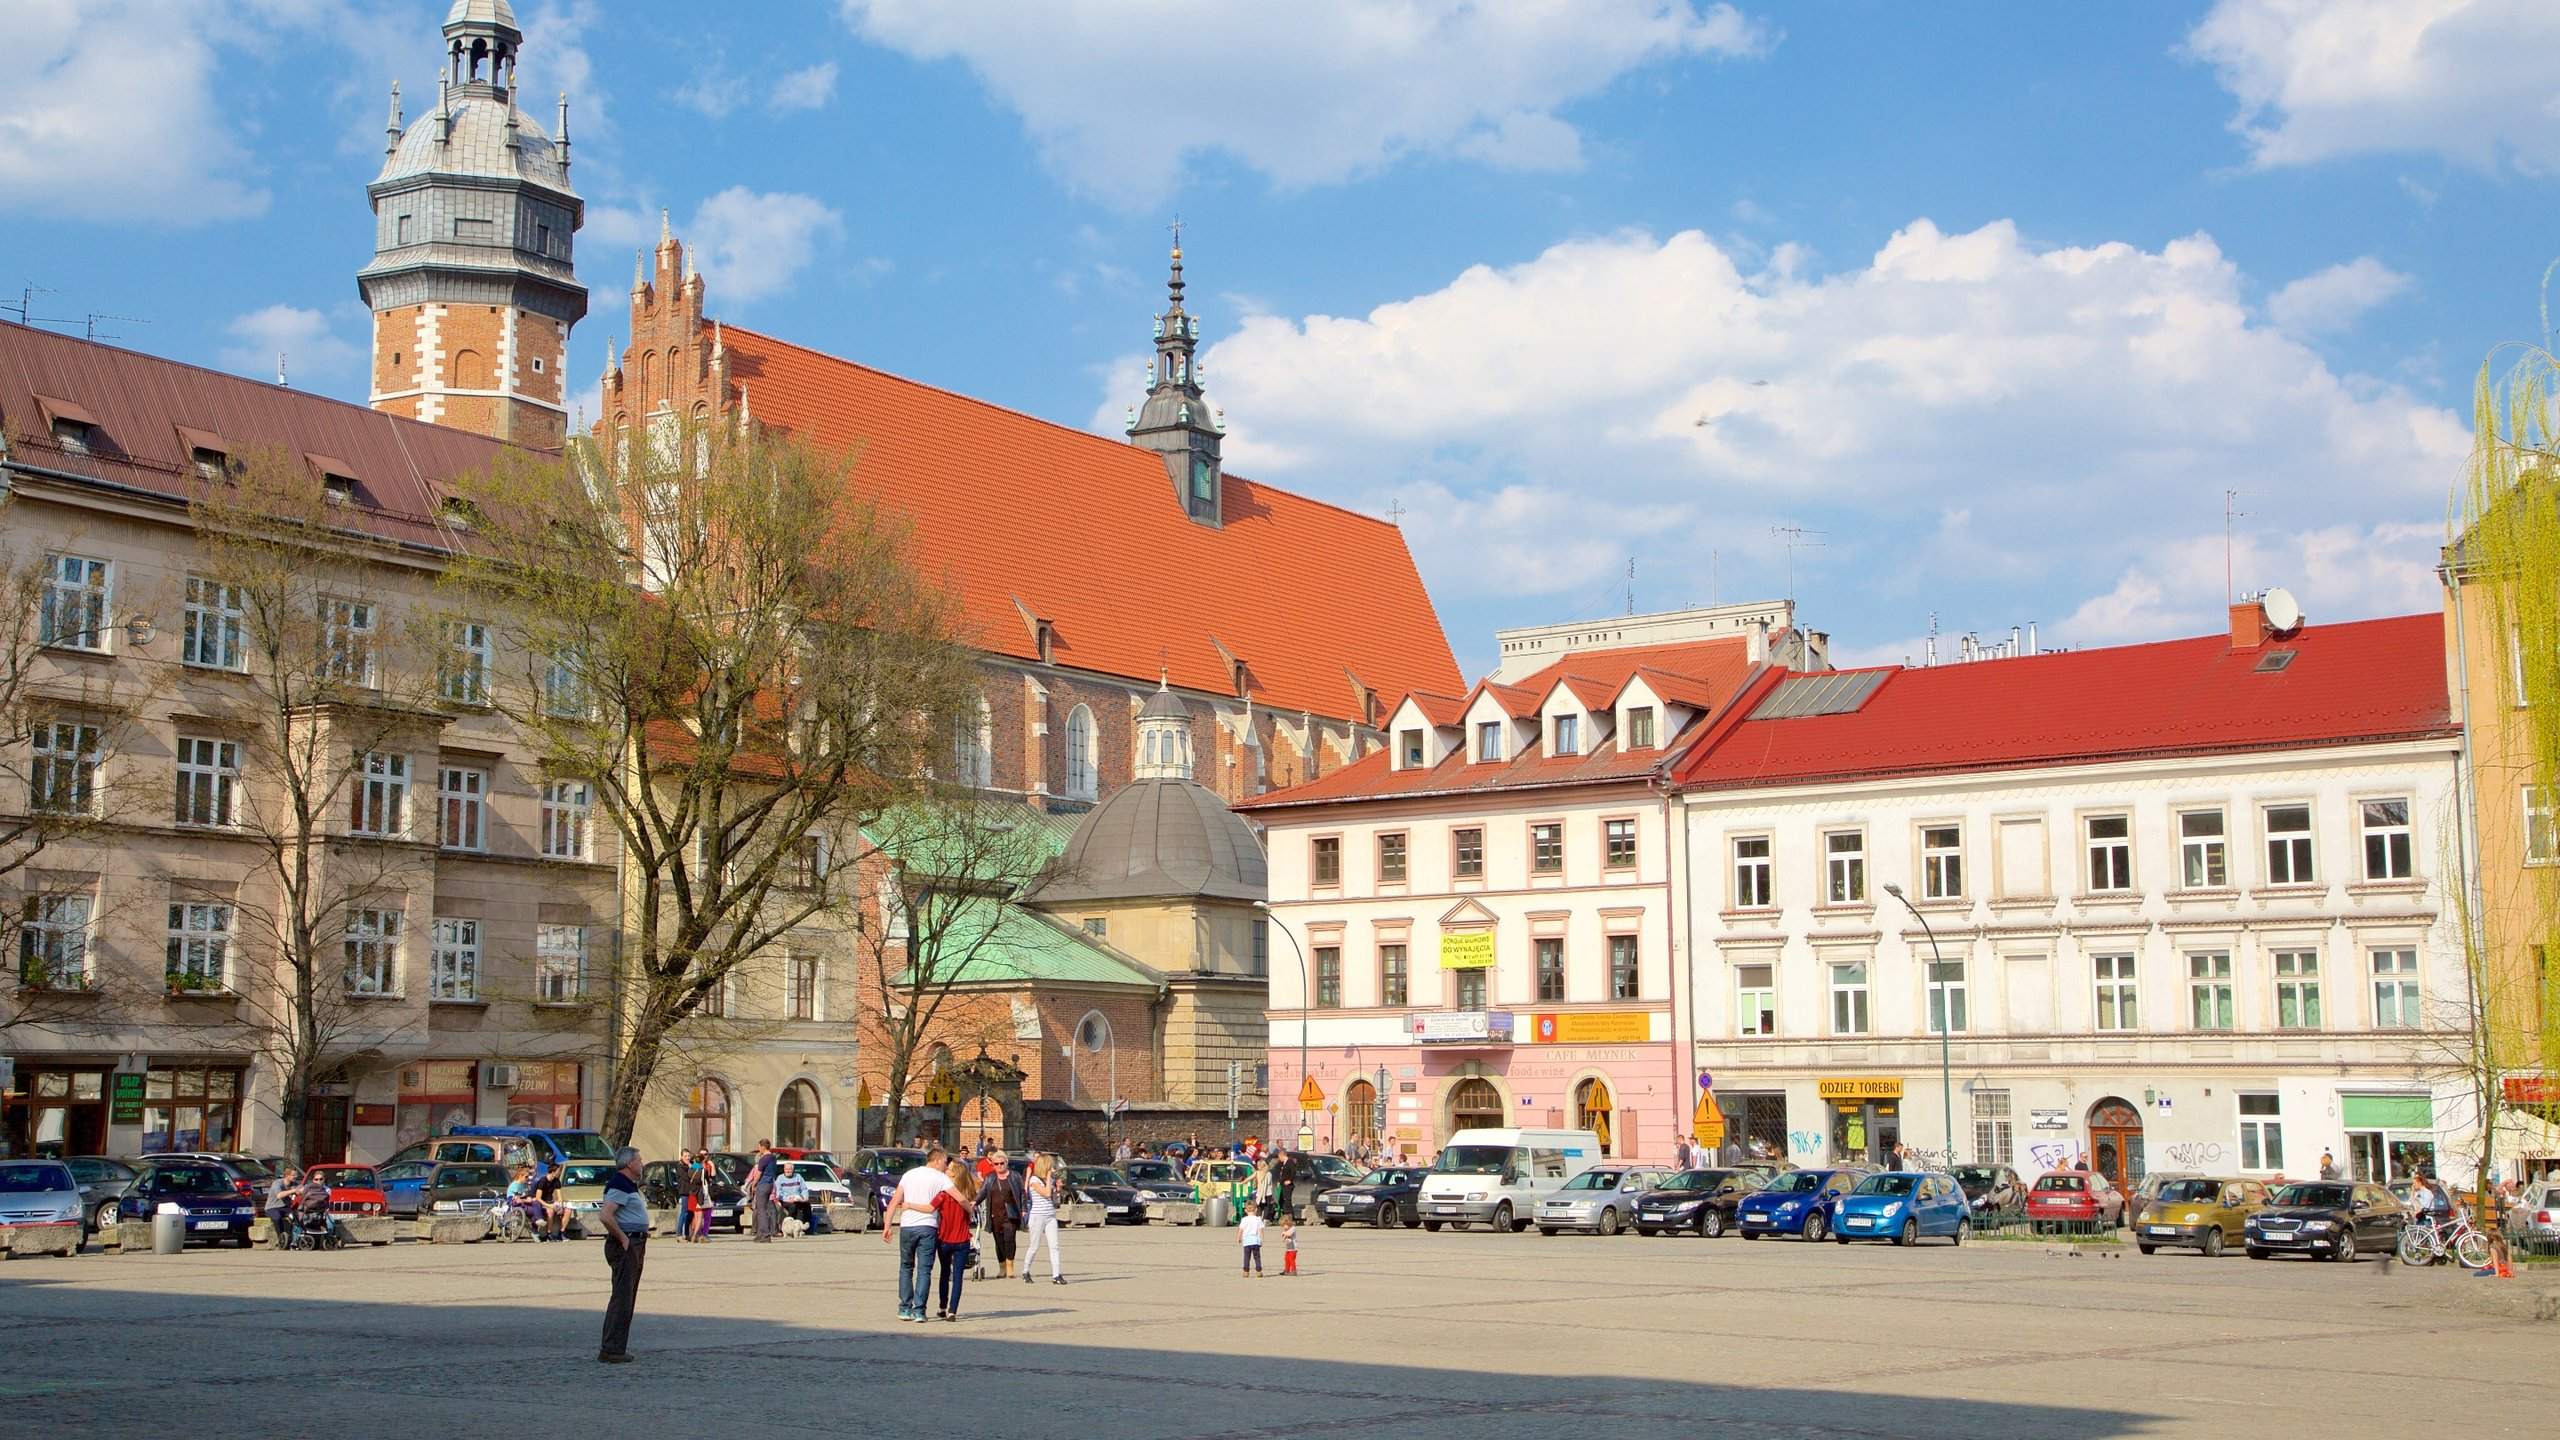 Kazimierz, Krakau, Woiwodschaft Kleinpolen, Polen